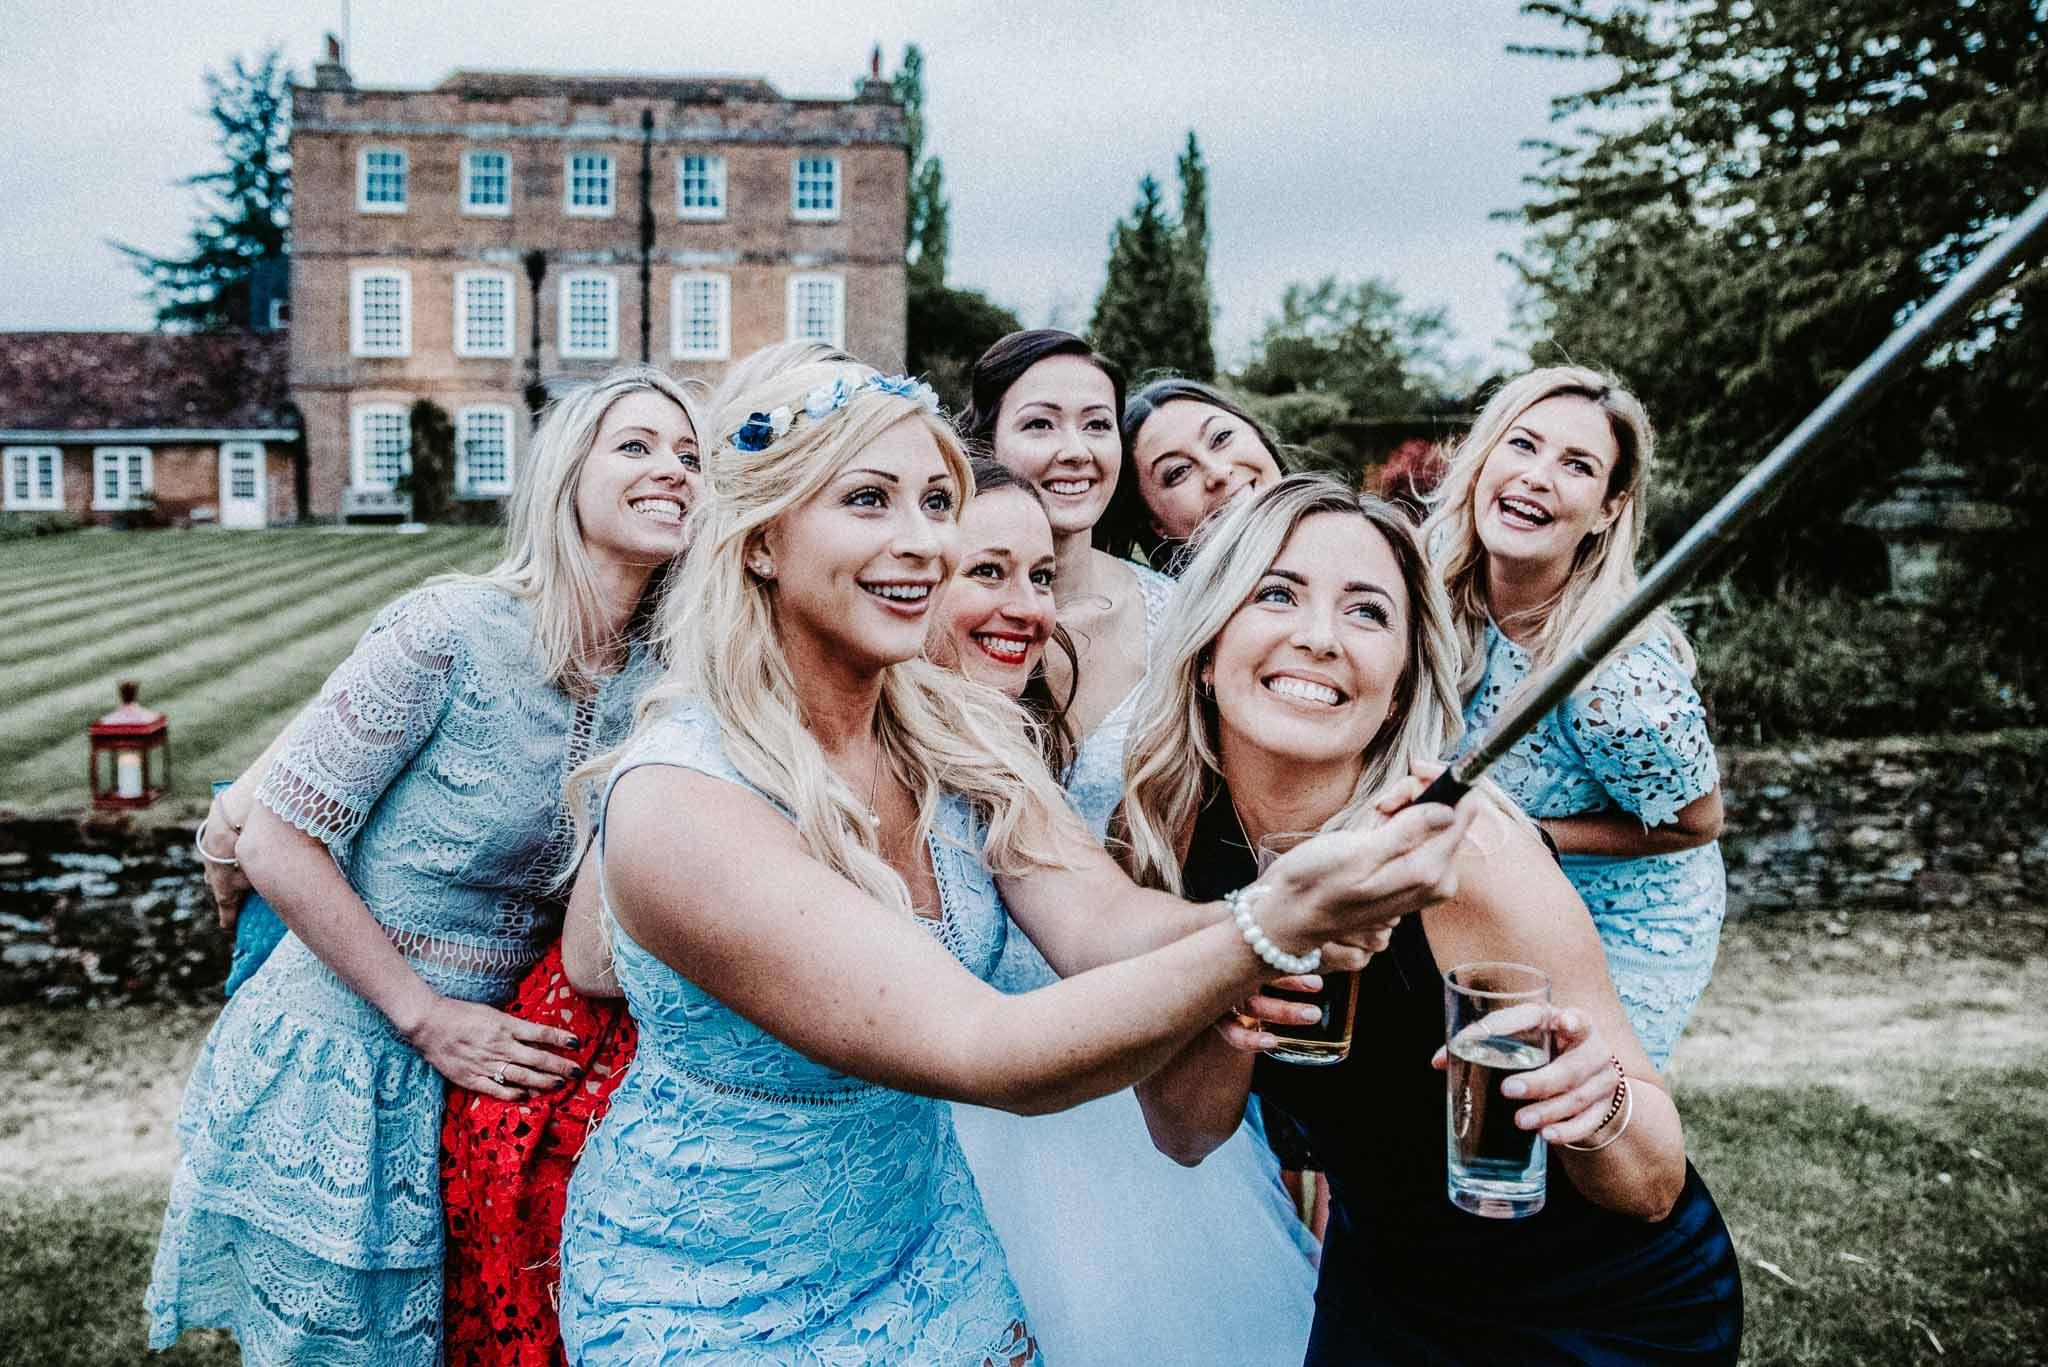 eggington house, maid of honour duties, wedding photographer Milton Keynes, top wedding photographer, bridesmaids dresses